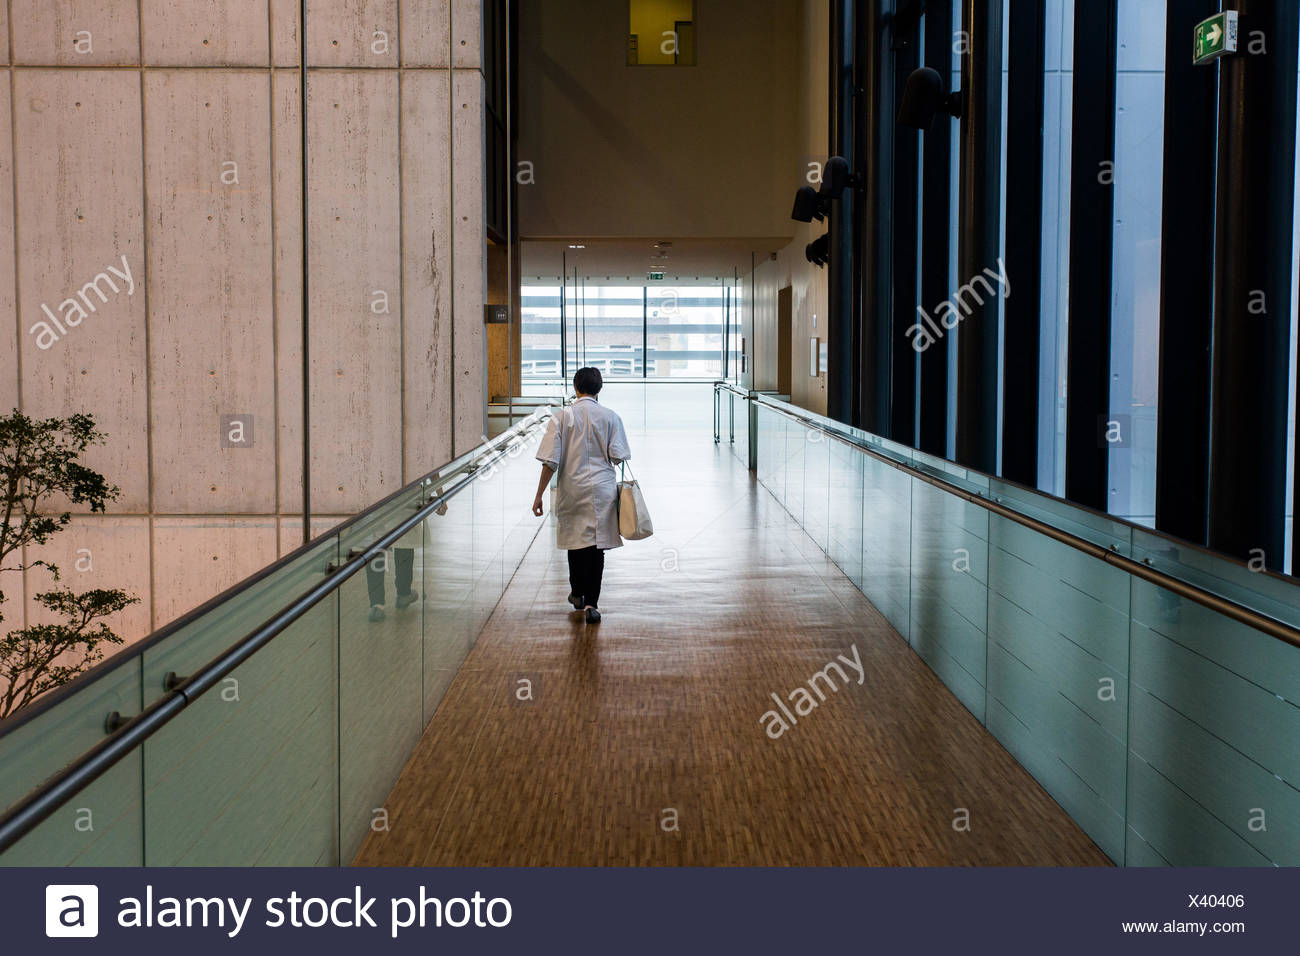 Hospital corridor. - Stock Image